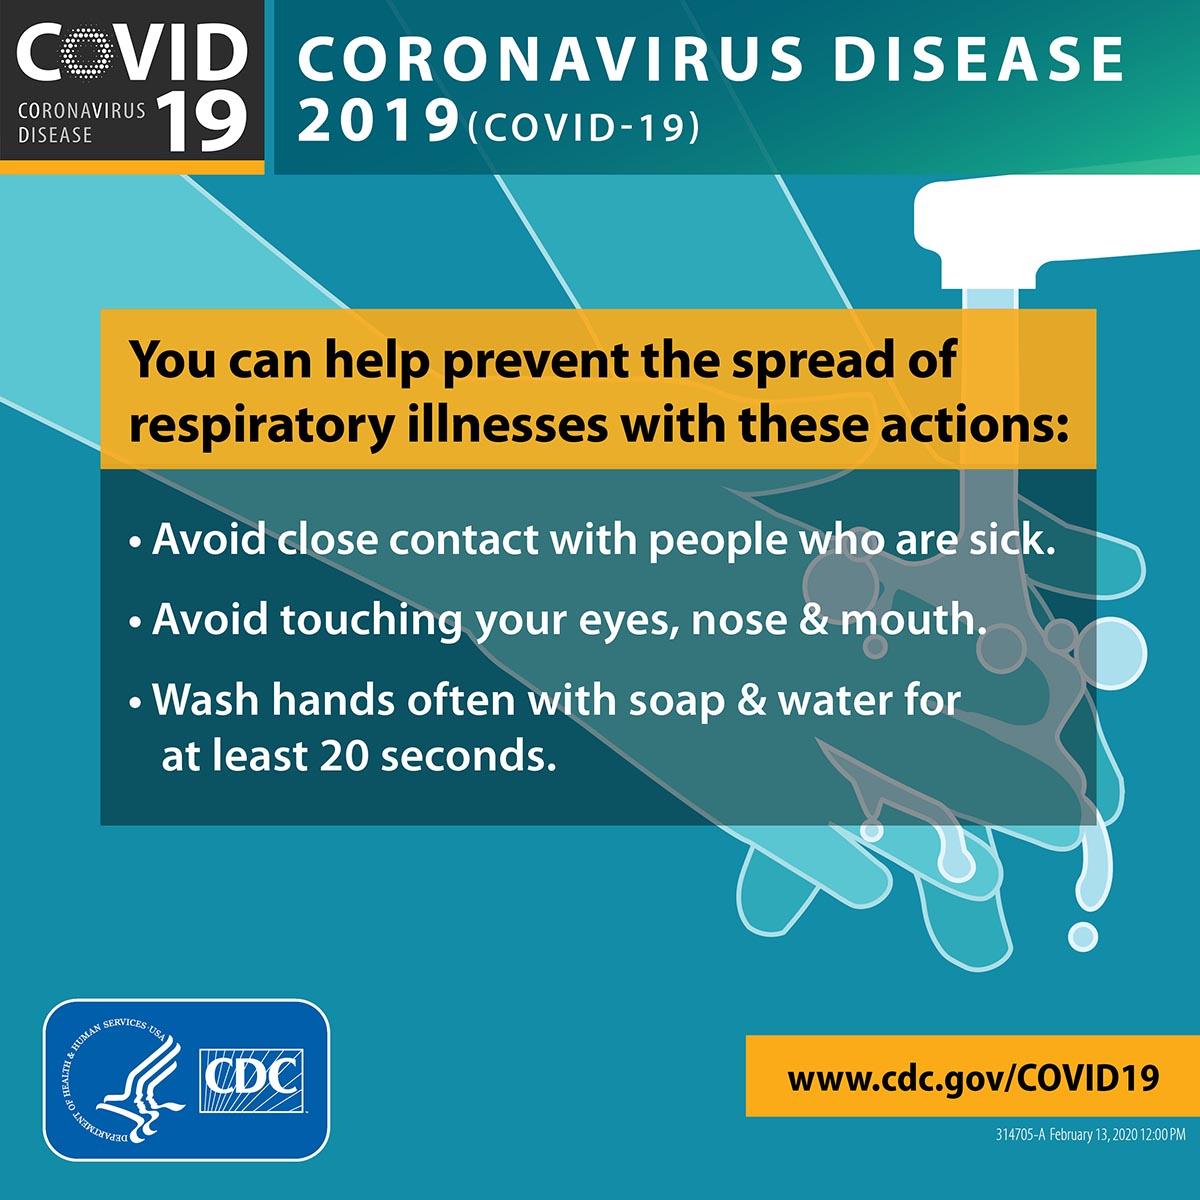 Infographic: Coronavirus Disease 2019 (COVID-19). You can help prevent the spread of respiratory illness